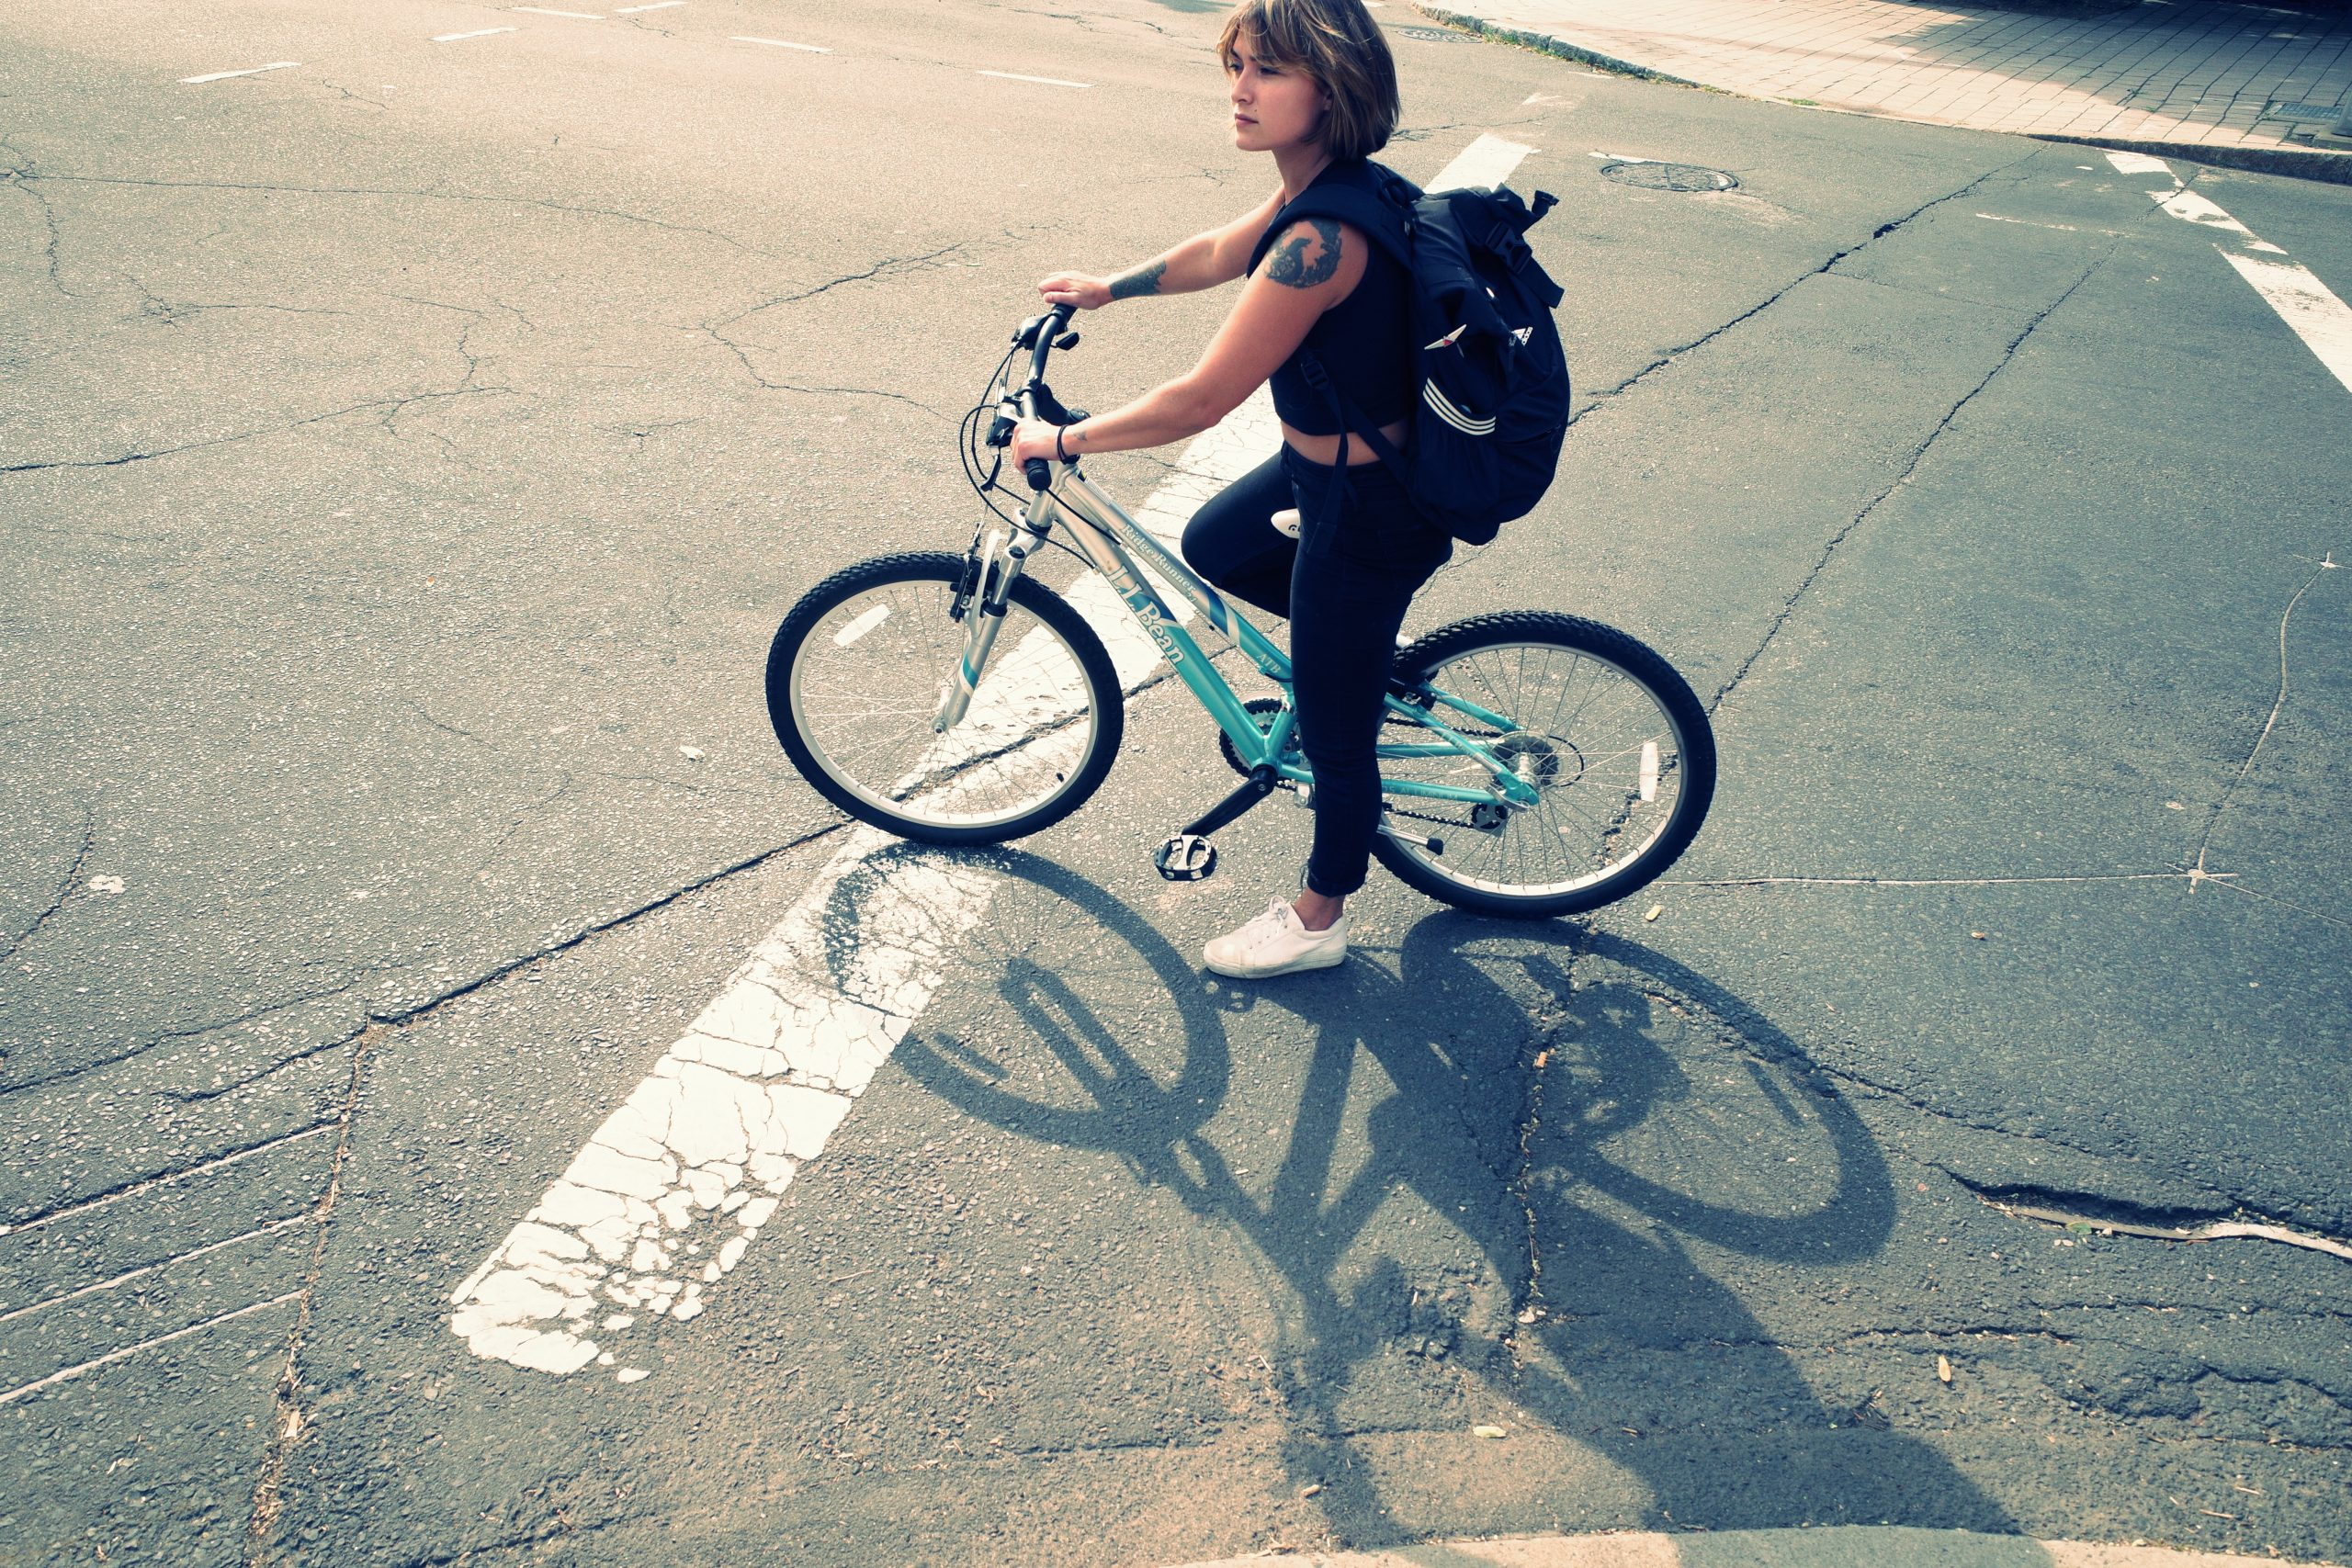 girl bicycle face high angle new haven ERIC KIM street photograph